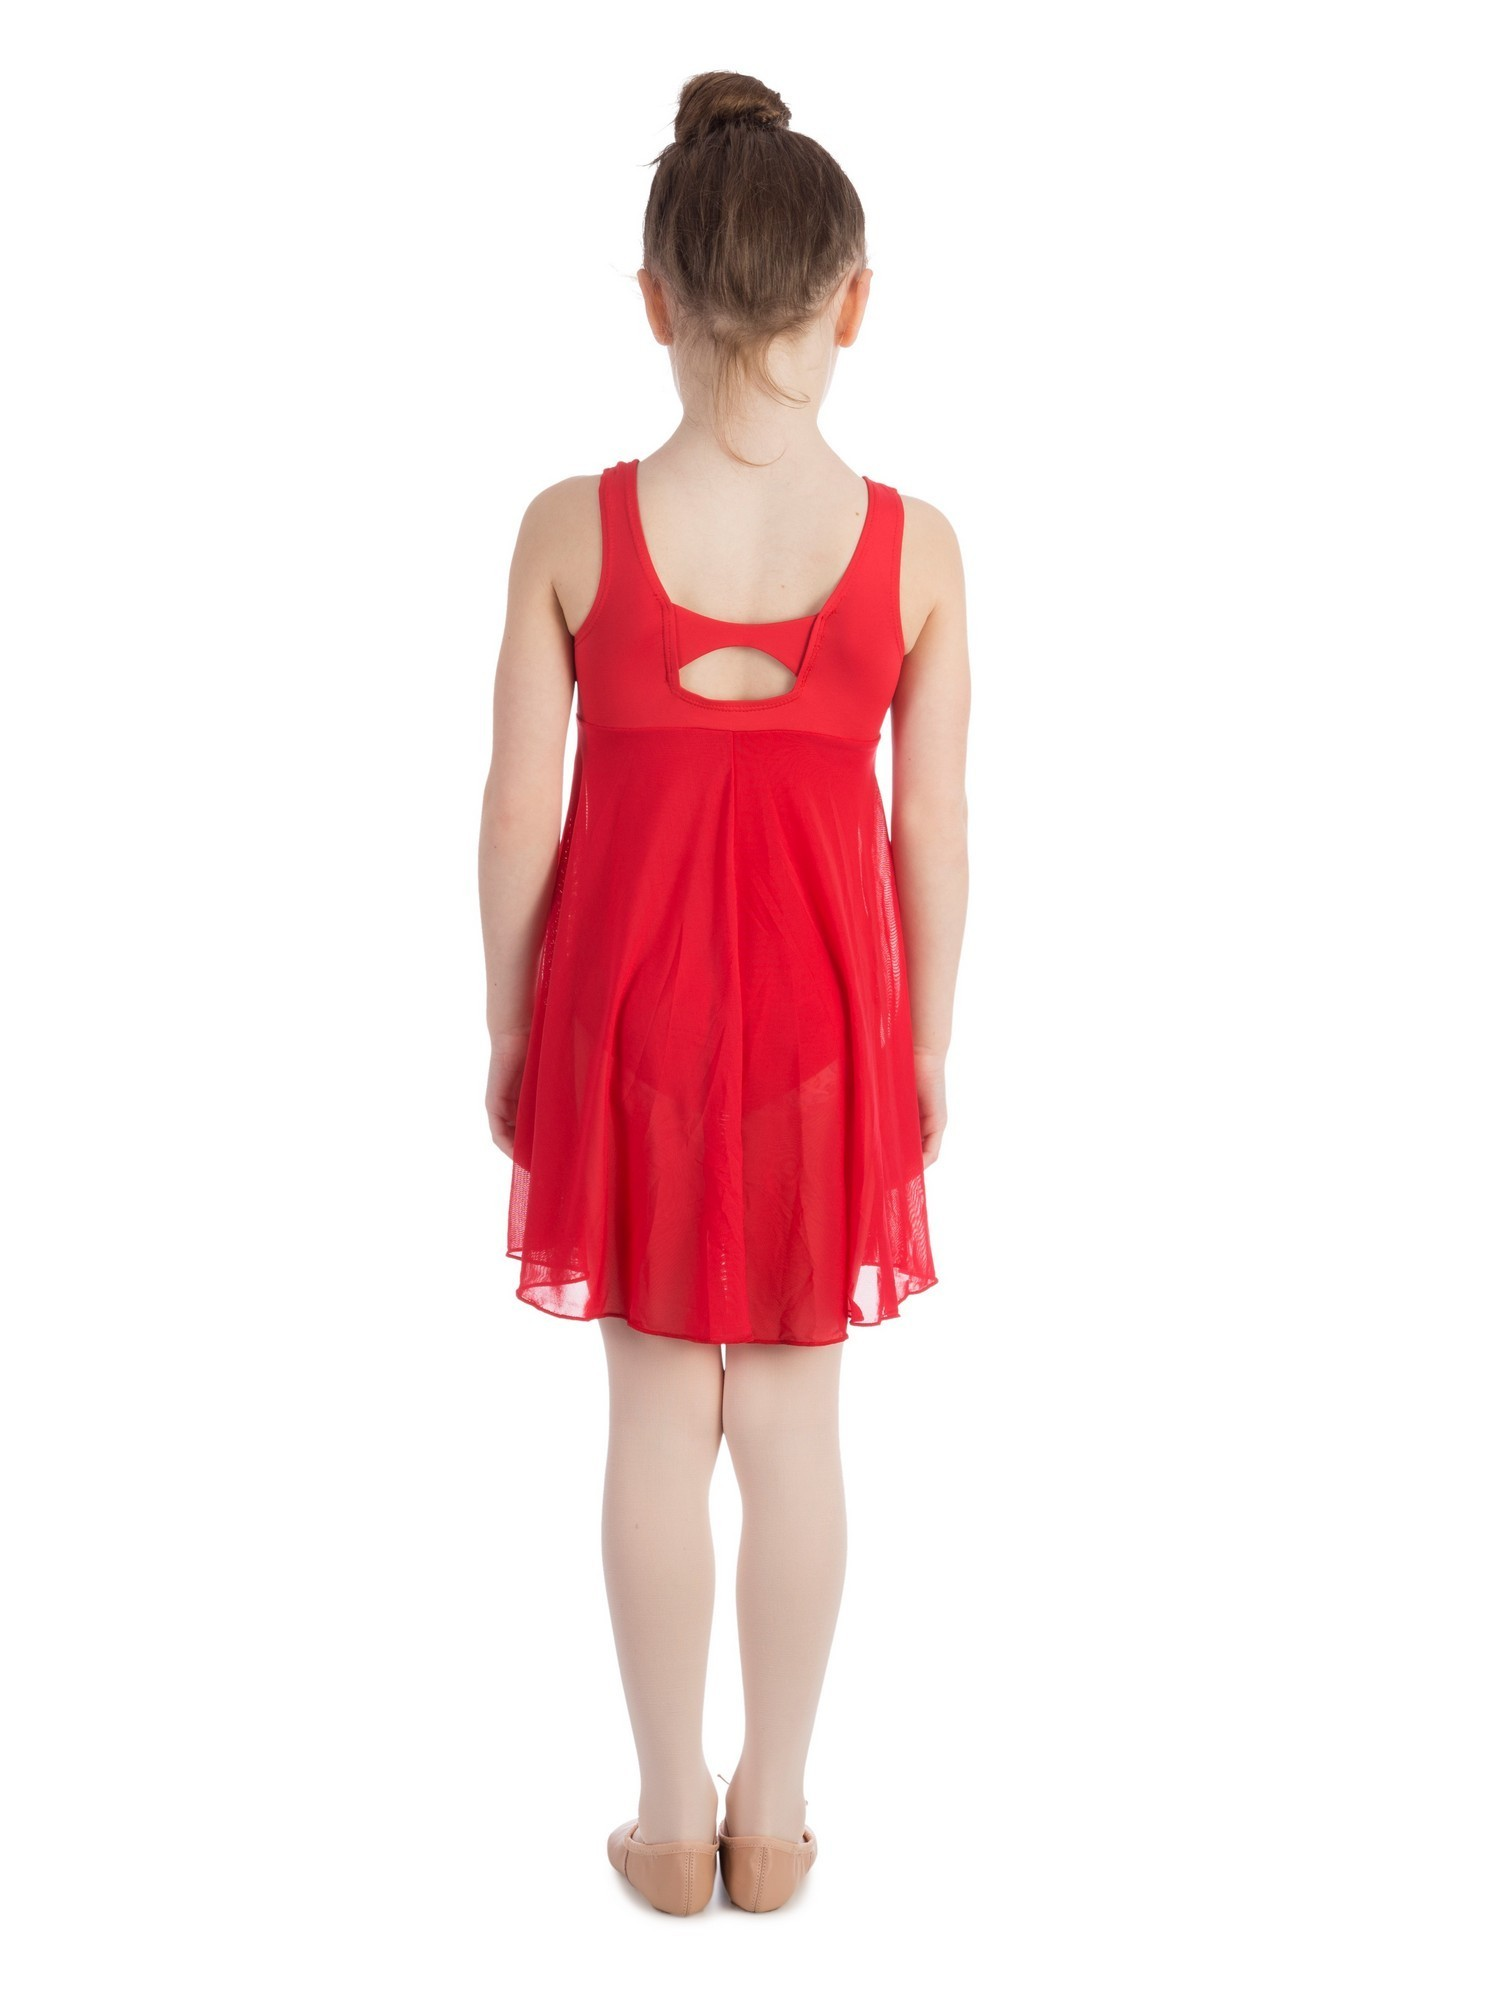 Multiple Colors Elowel Kids Girls Empire Leotard Dress / Size 2-14 Years